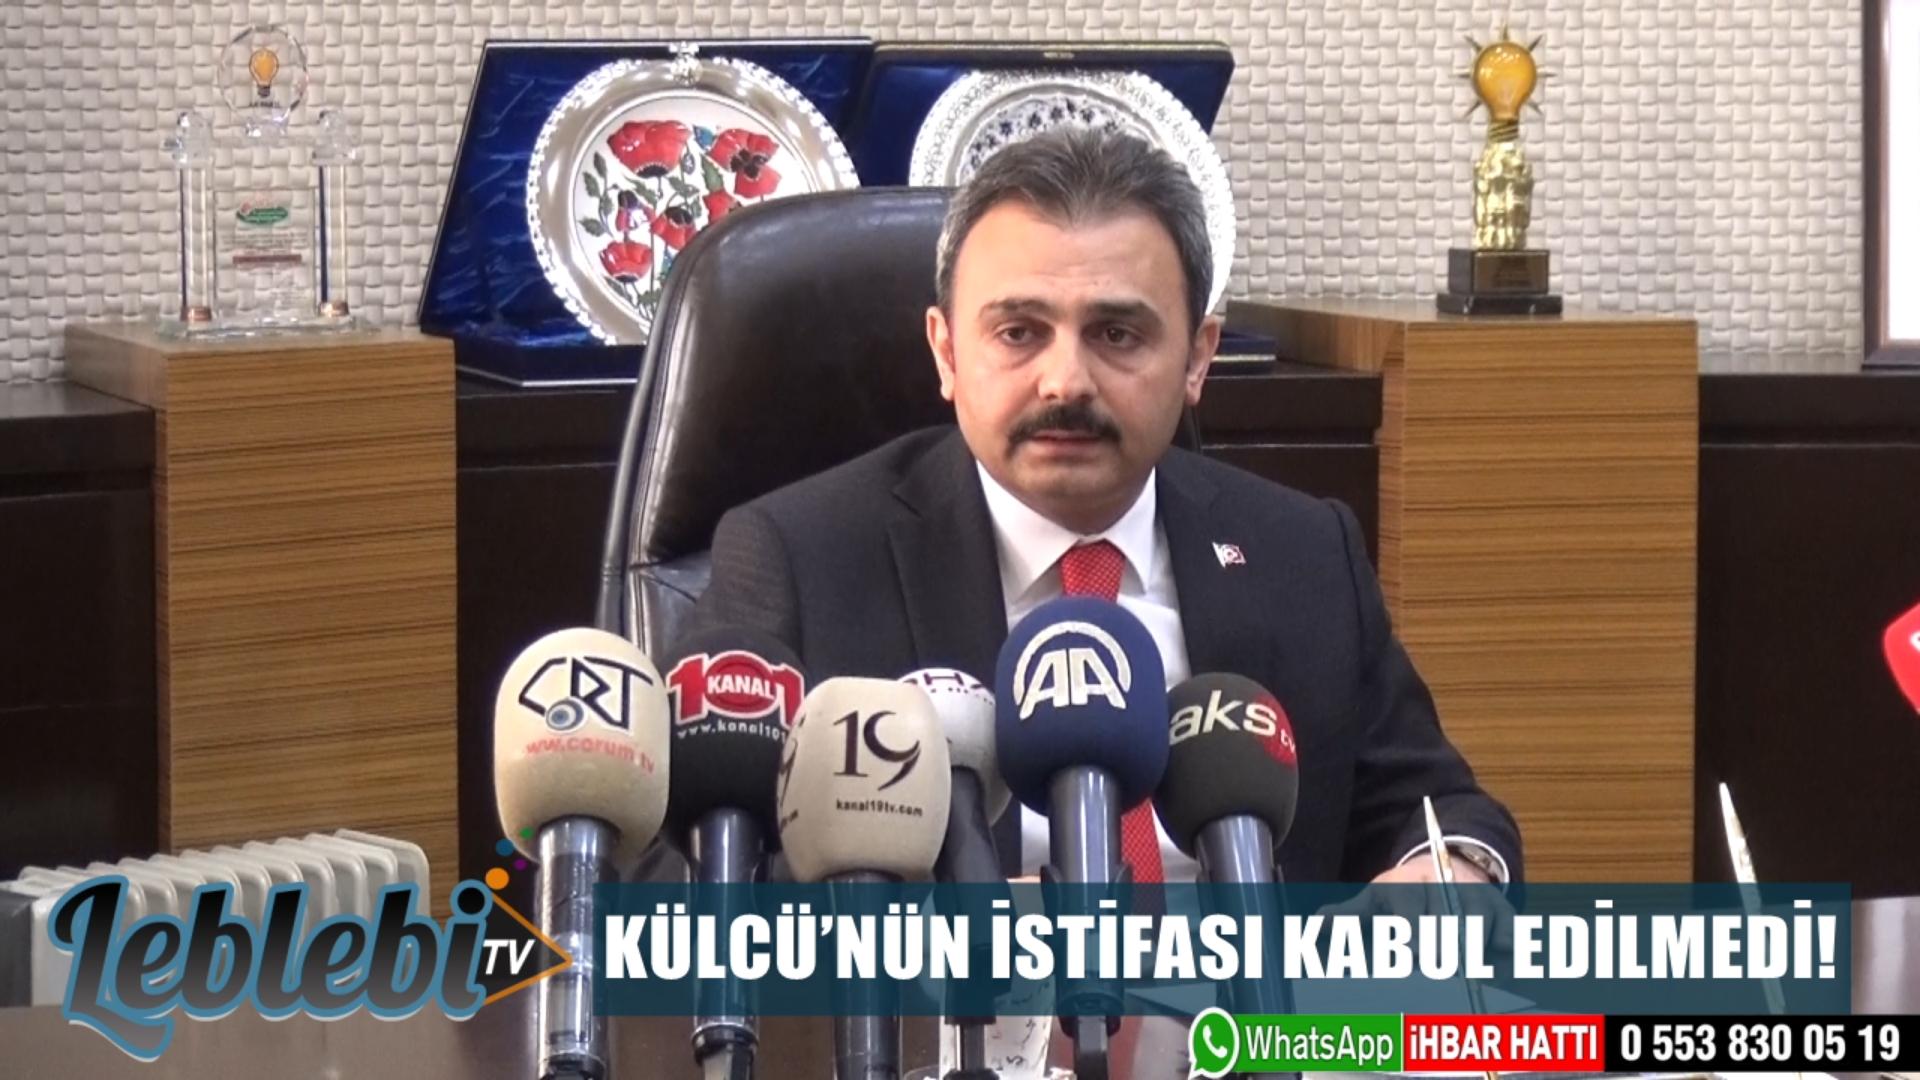 KÜLCÜ'NÜN İSTİFASI KABUL EDİLMEDİ!